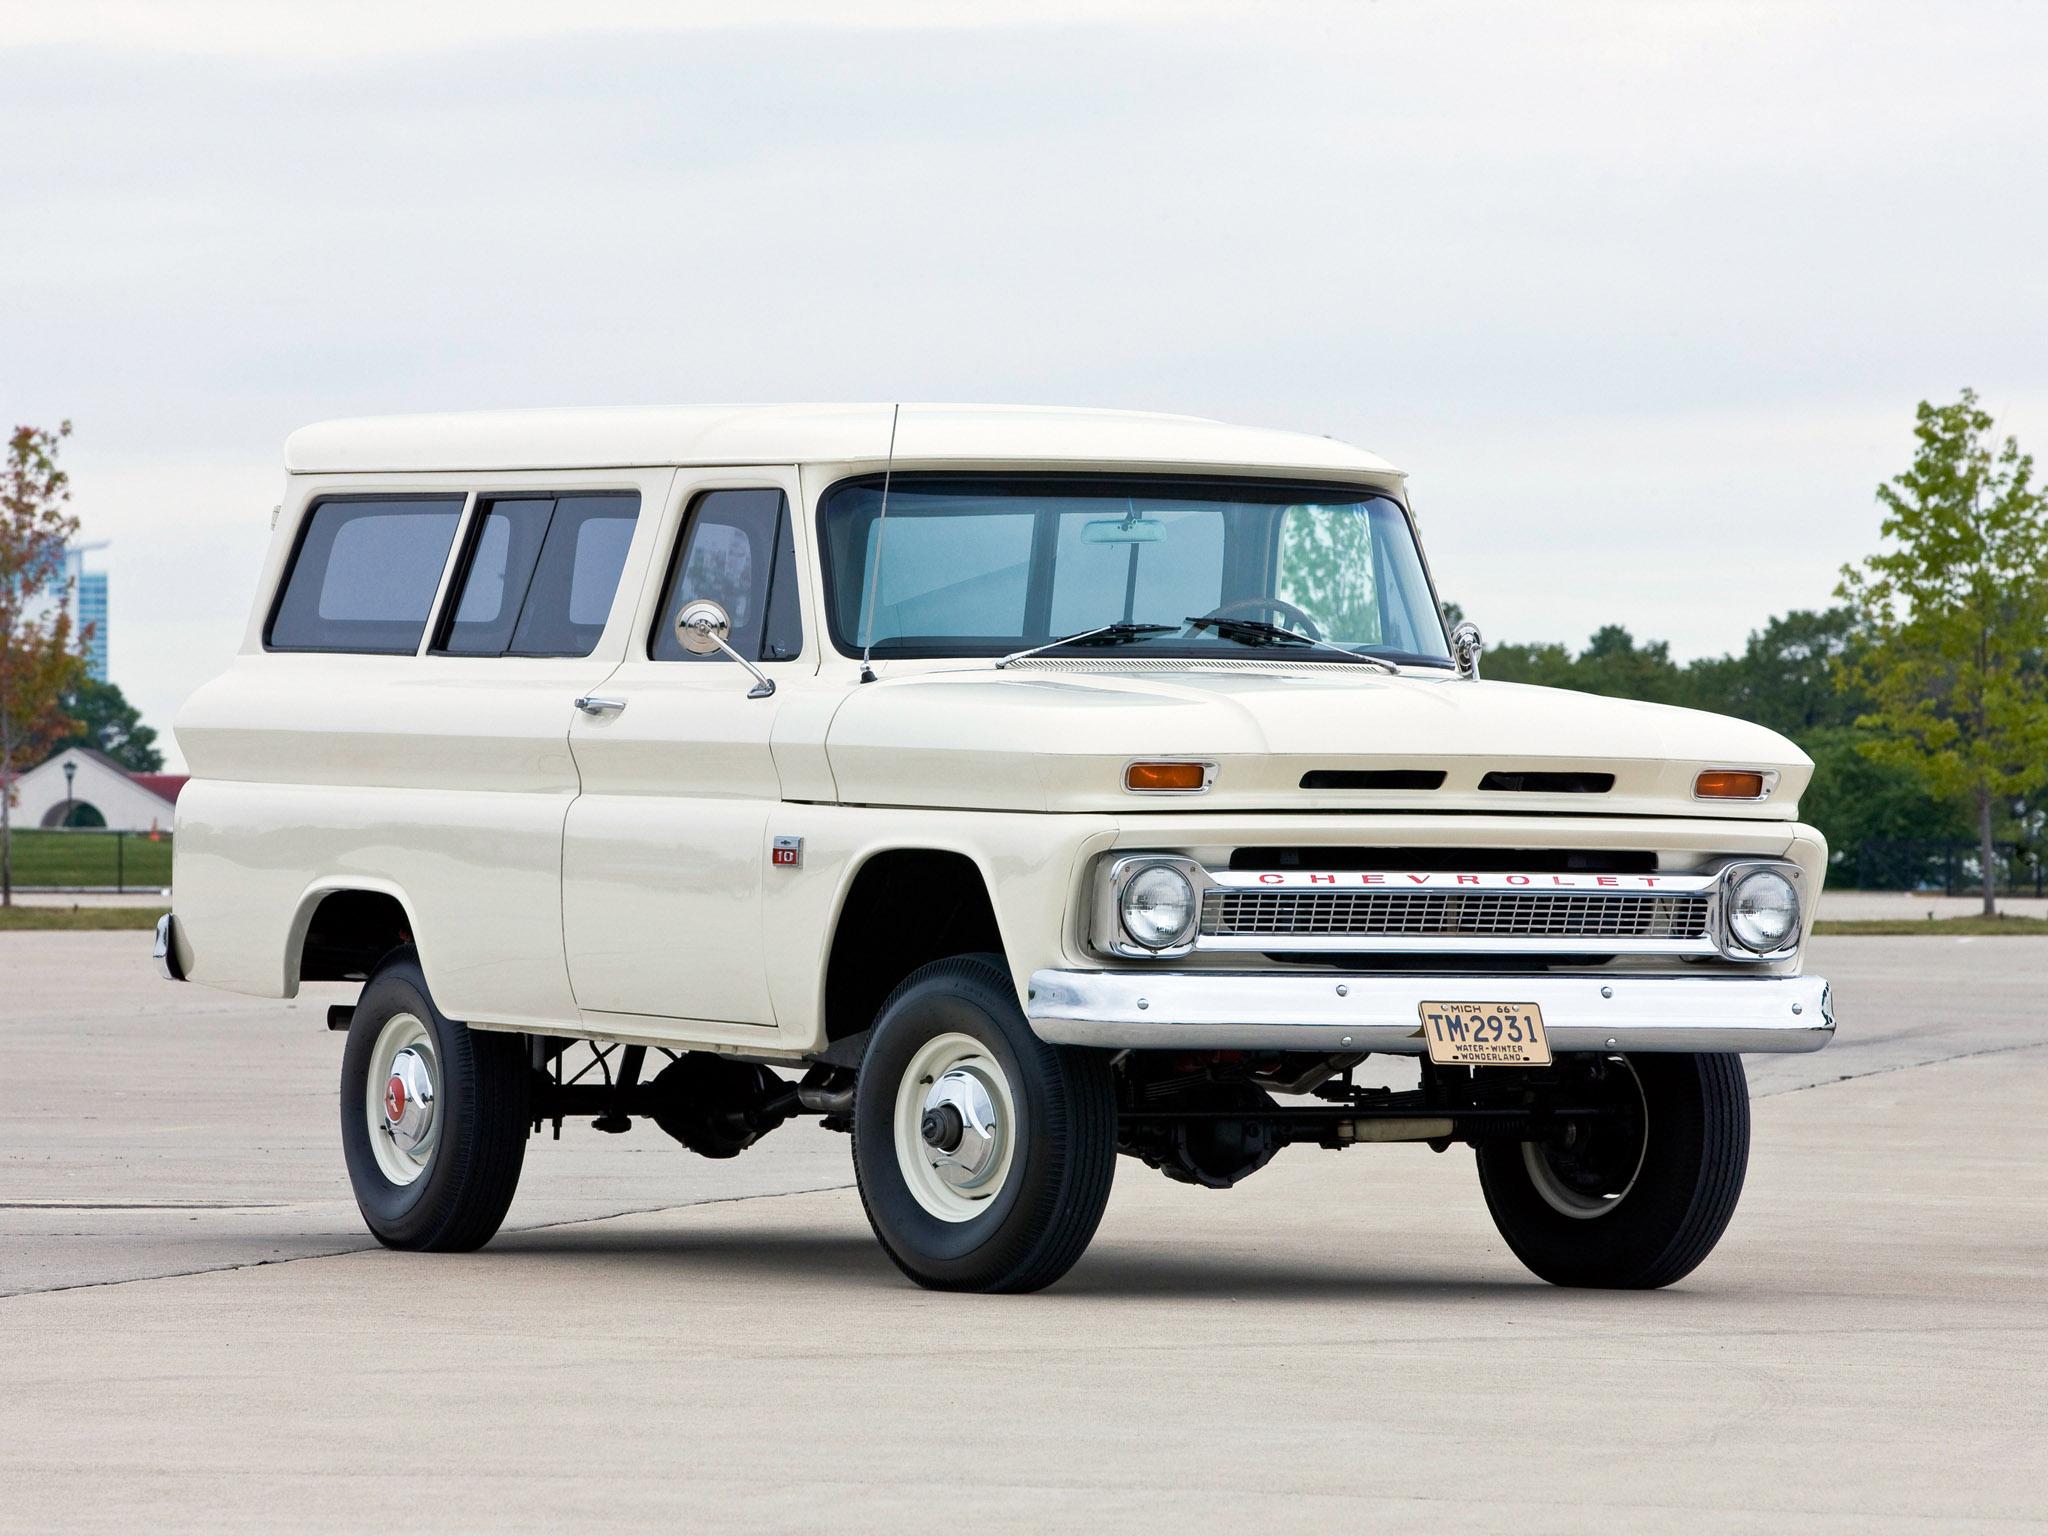 1965 Chevrolet Suburban 4x4 truck classic wallpaper   2048x1536 ...